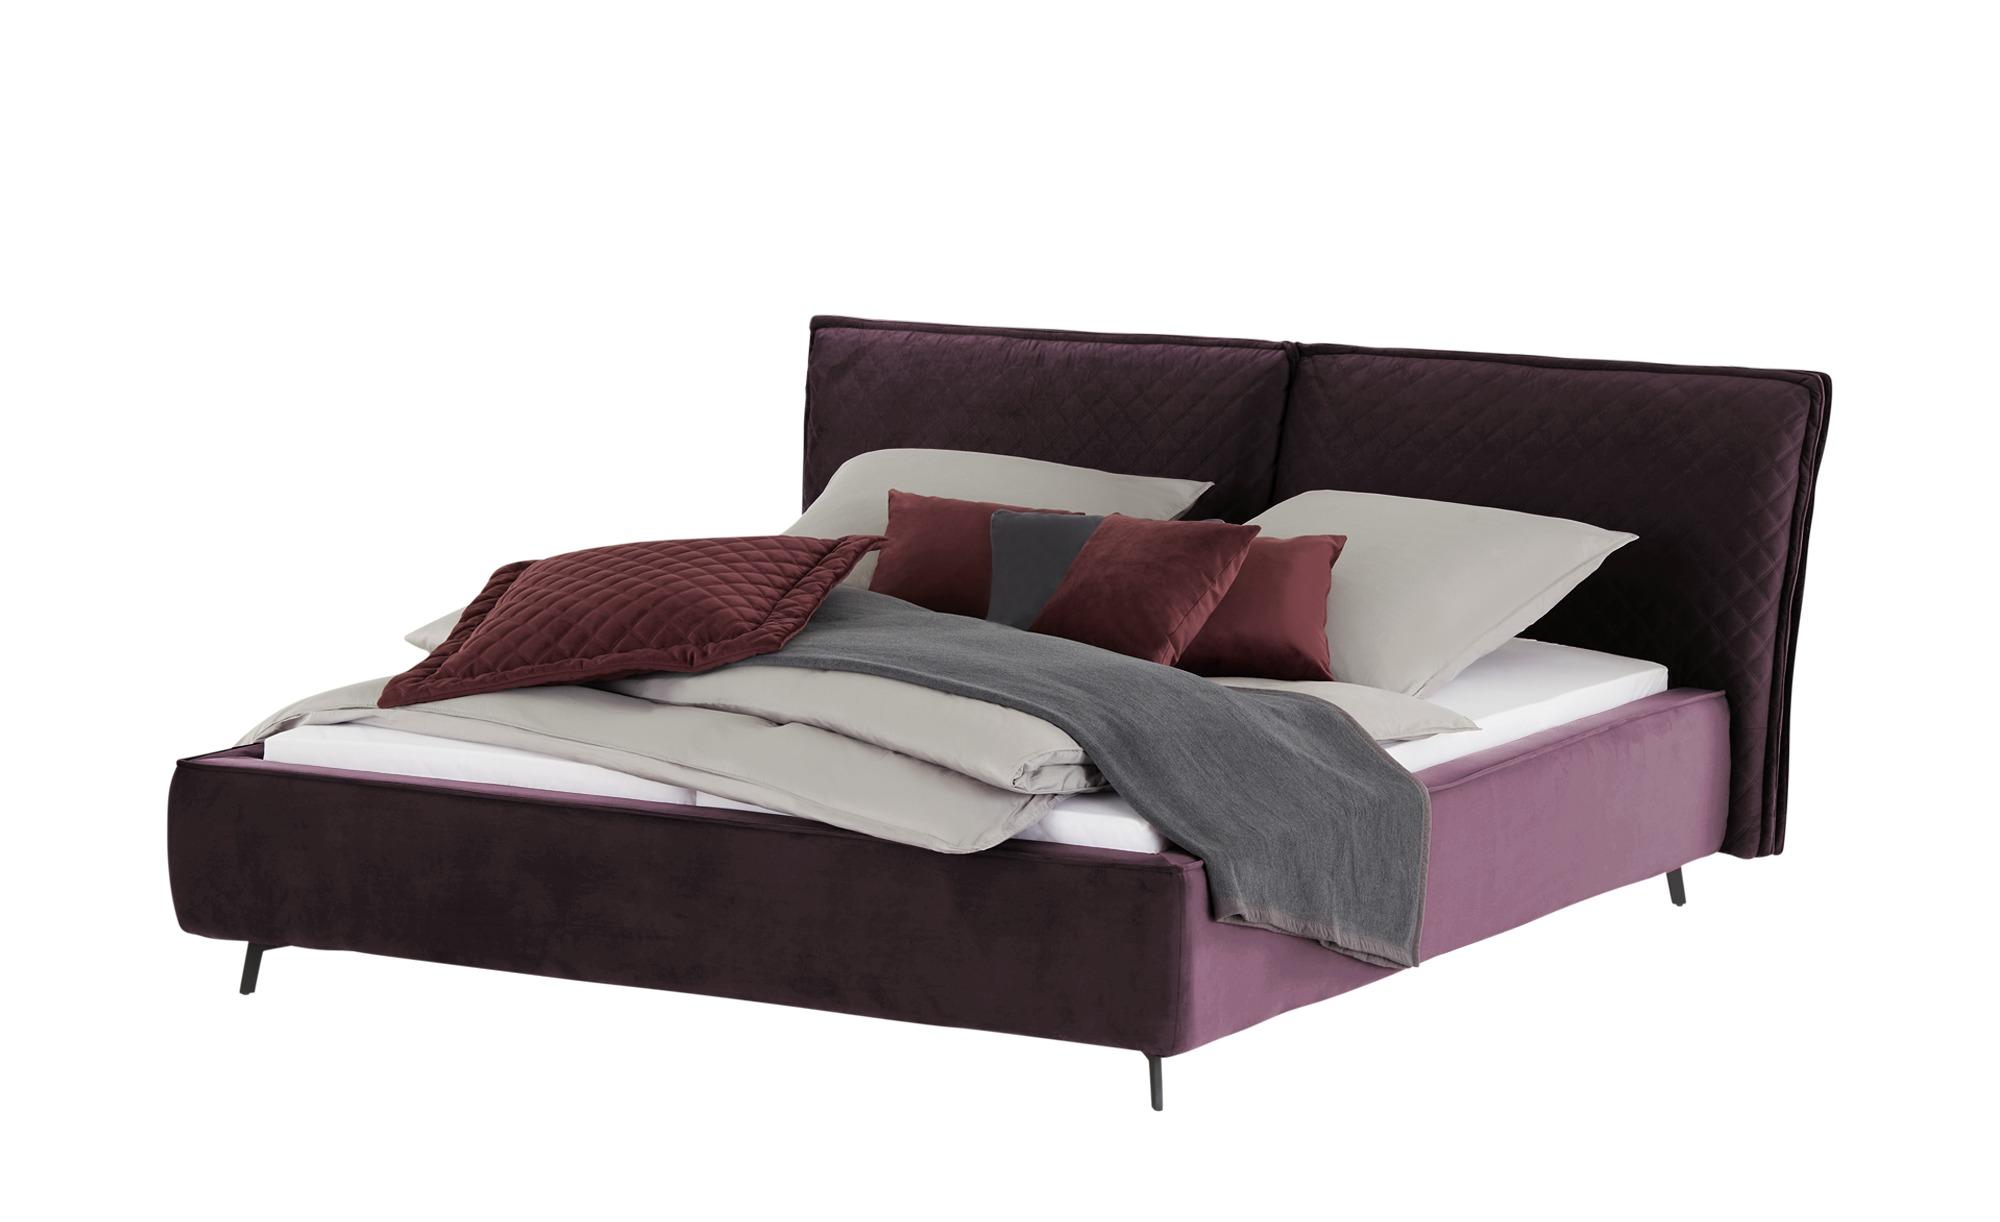 pop Polsterbettgestell  Sunset ¦ lila/violett ¦ Maße (cm): B: 223 H: 105 Betten > Polsterbetten - Höffner